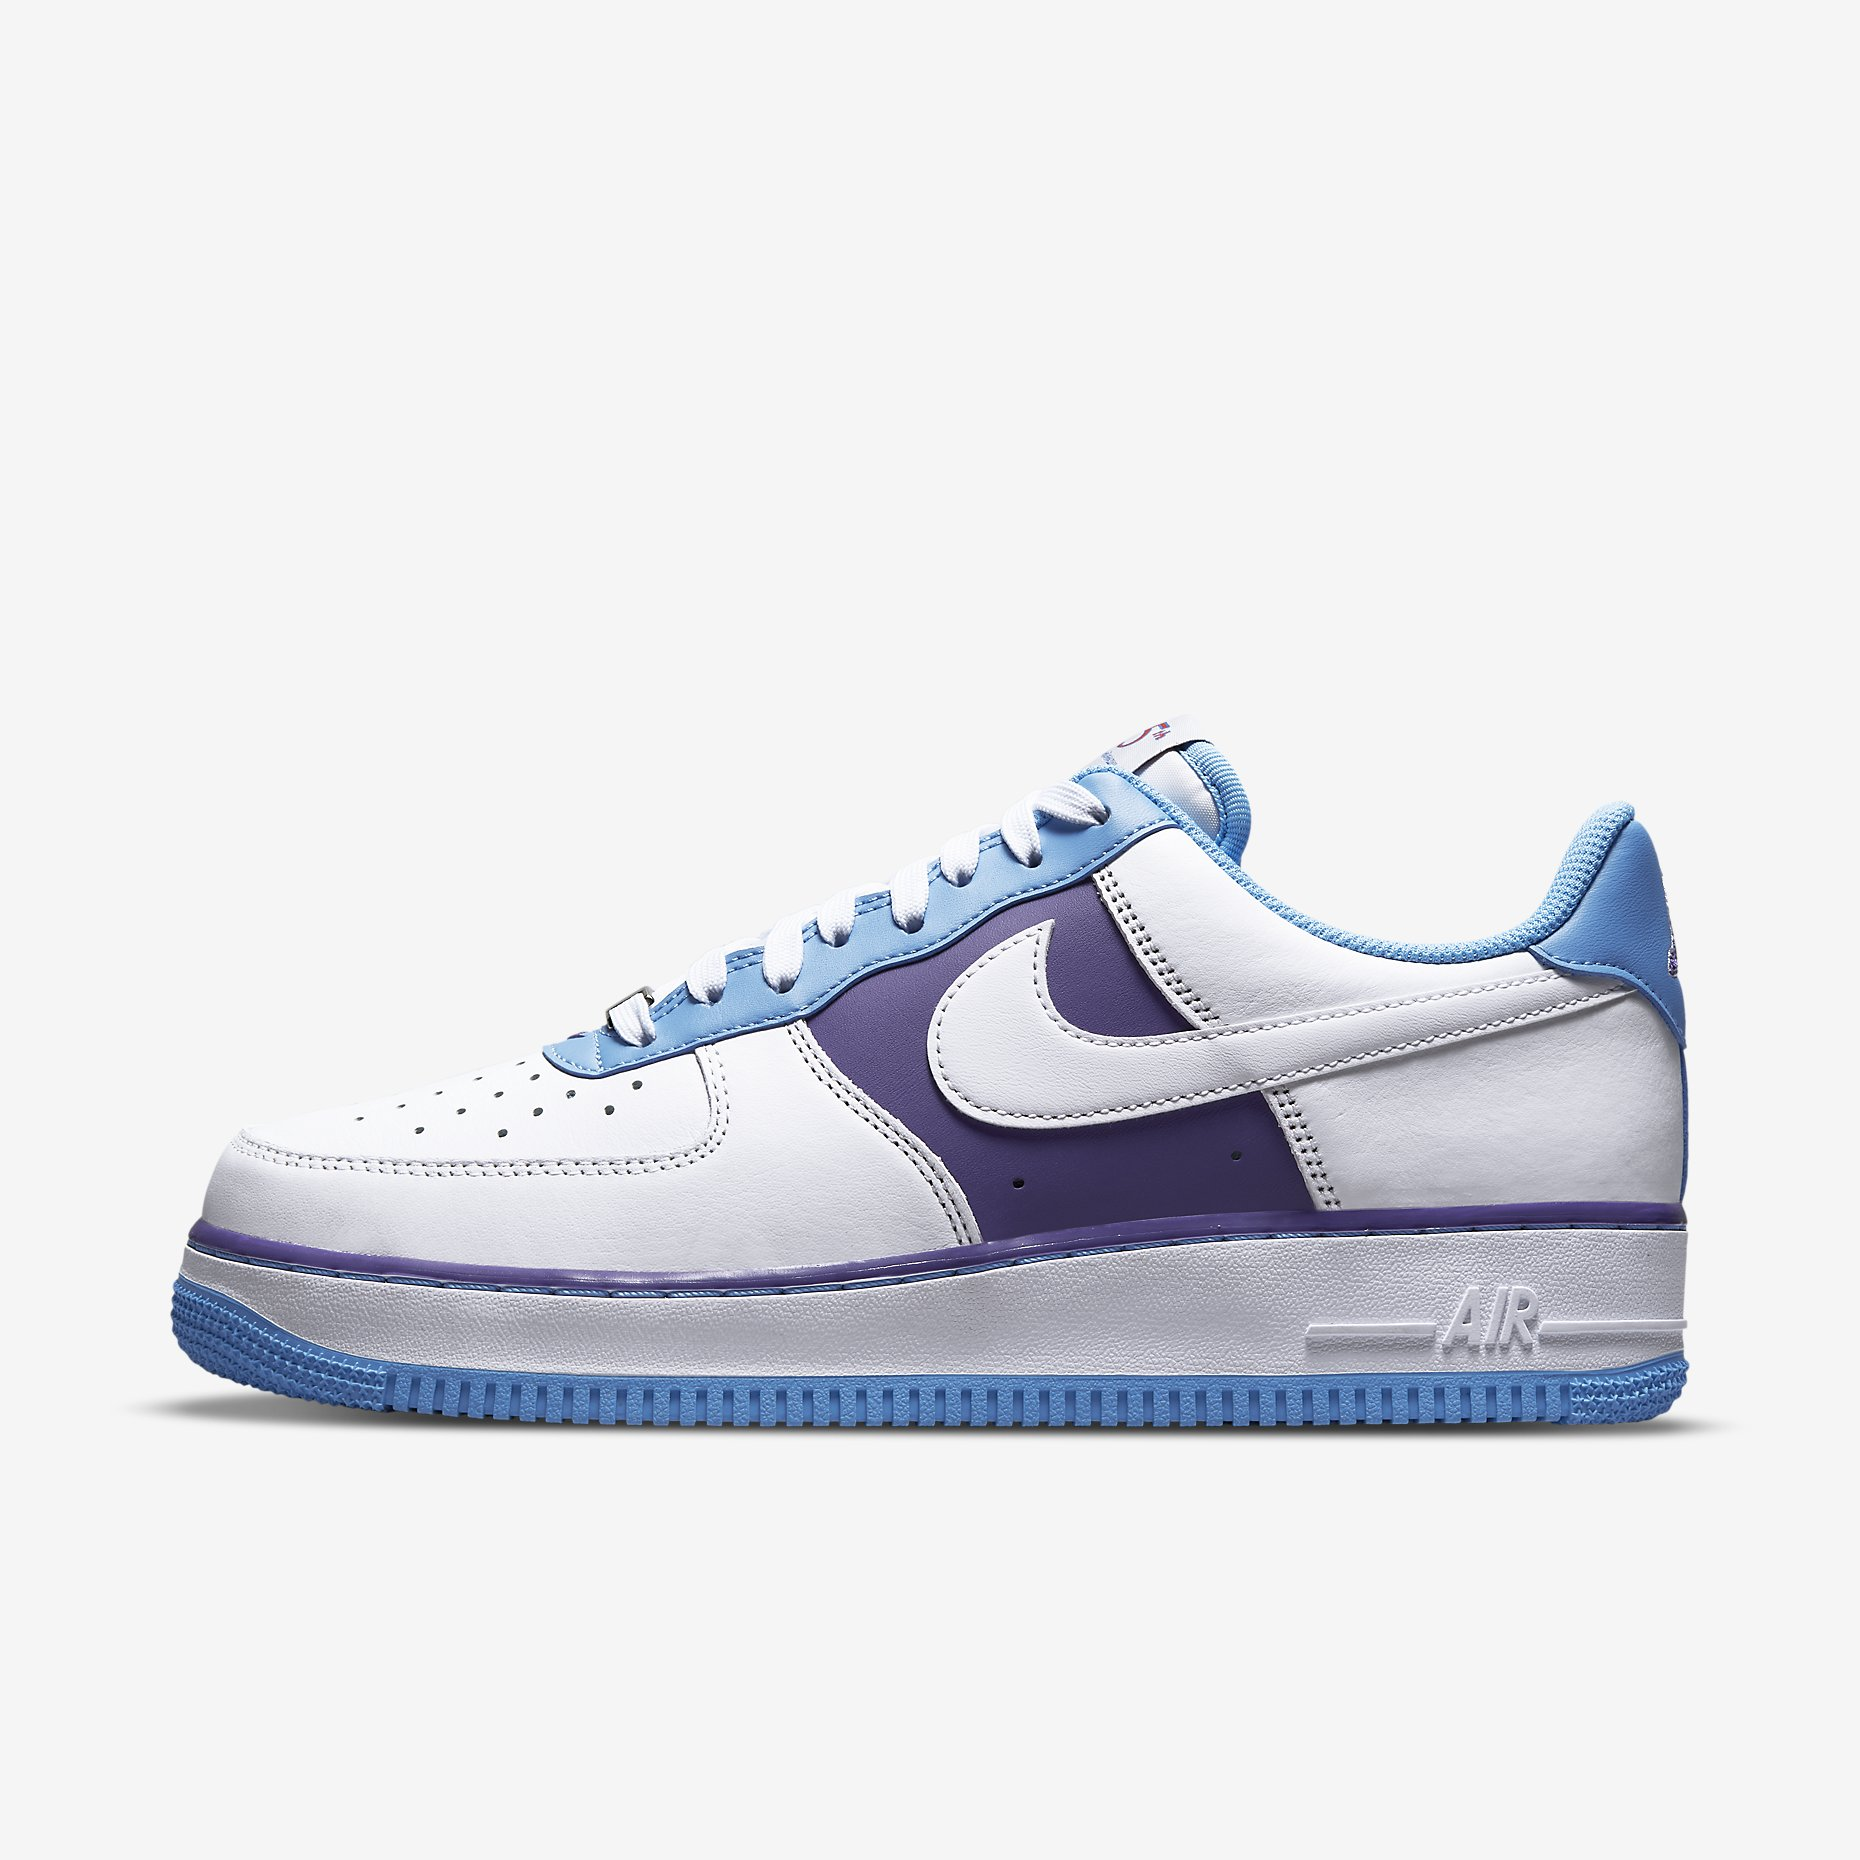 NBA x Nike Air Force 1 '07 LV8 'Lakers'